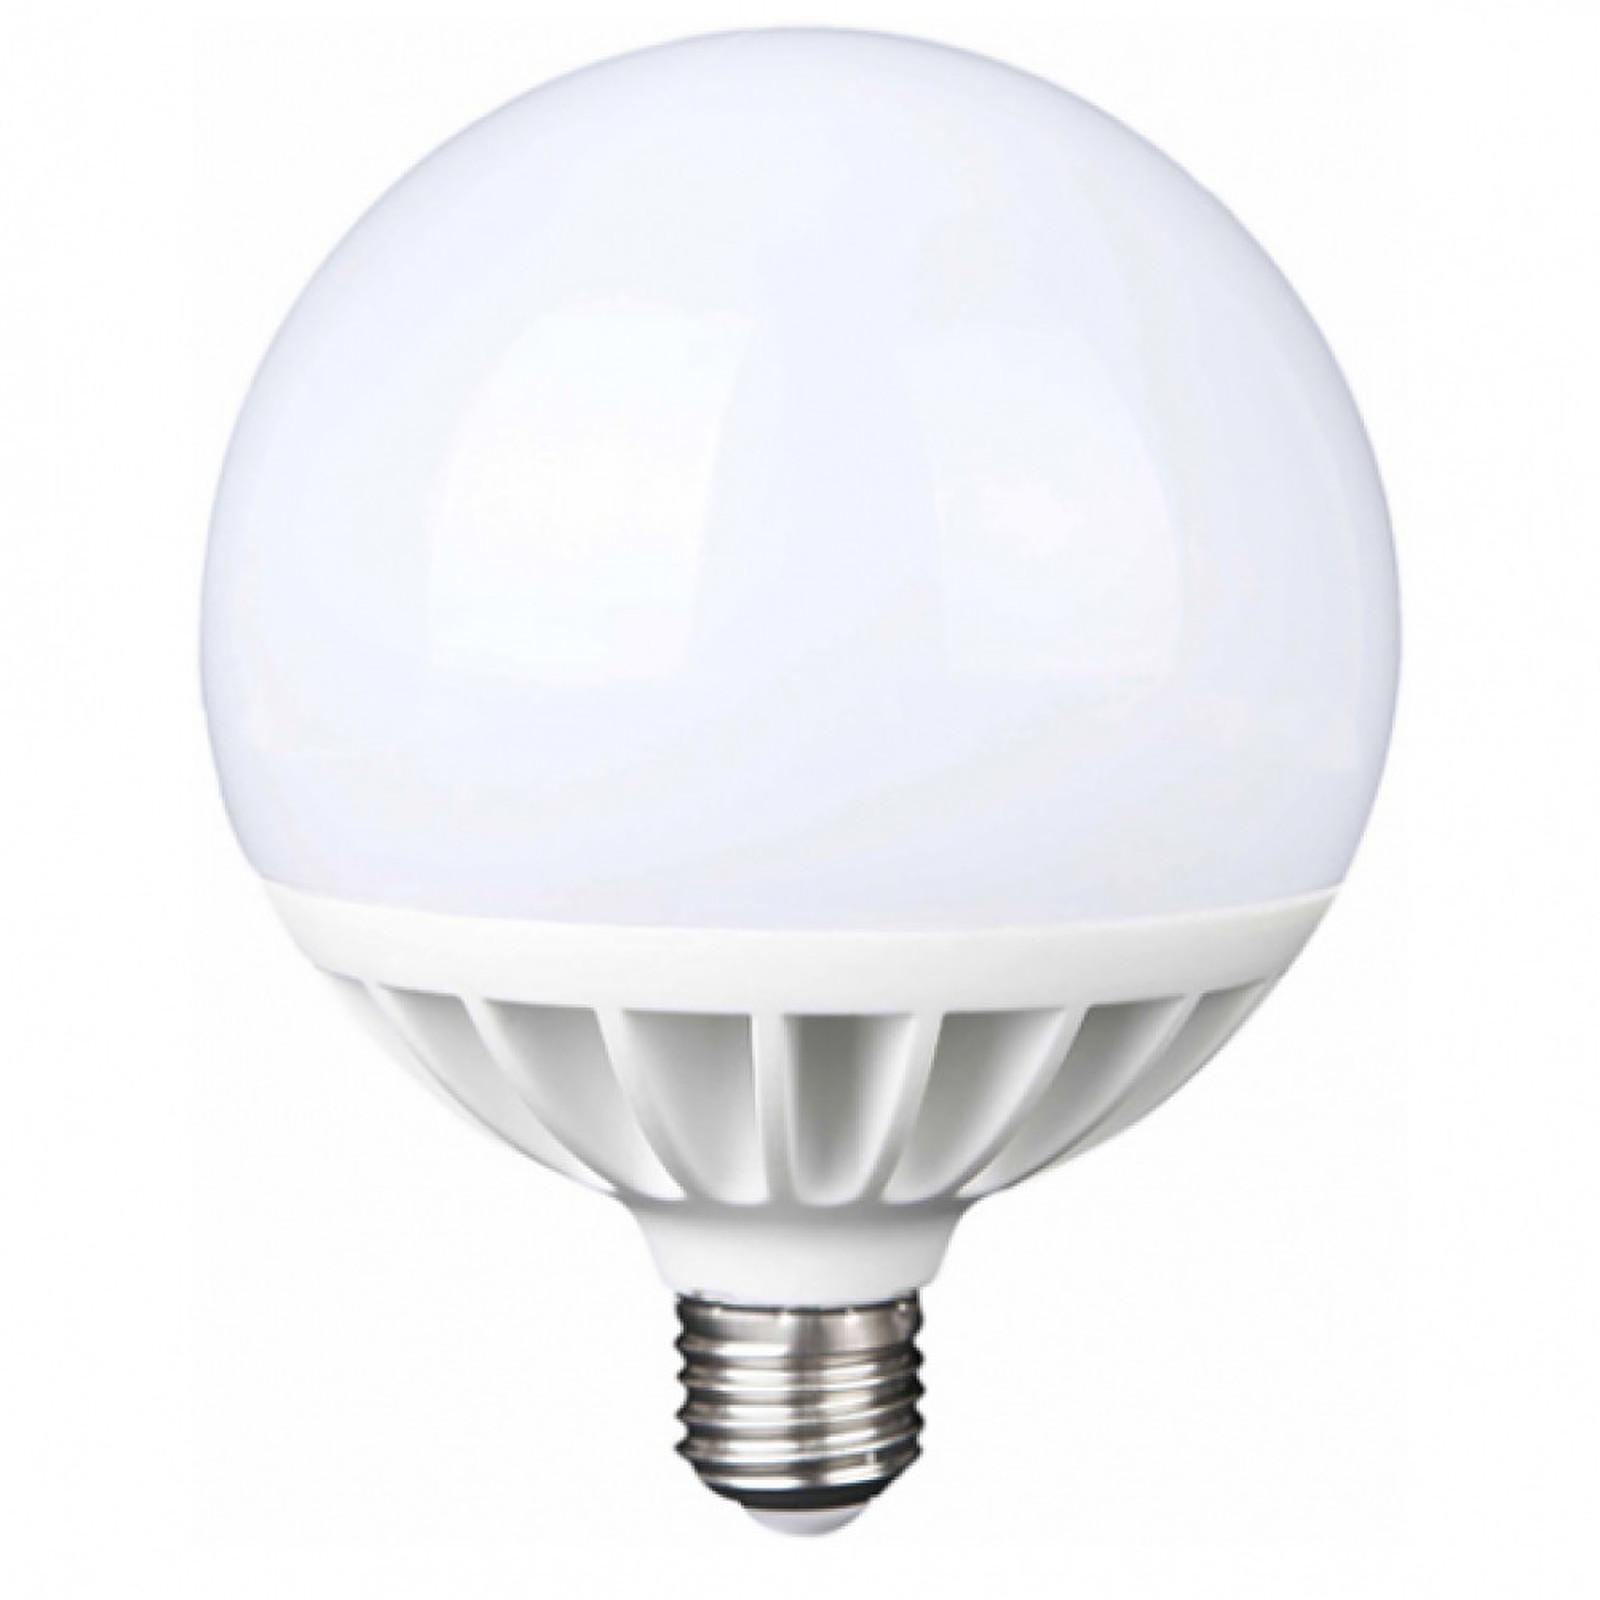 FamilyLed Ampoule Led Globe Autodimmable 12w Blanc Chaud FAM_DIMG95123